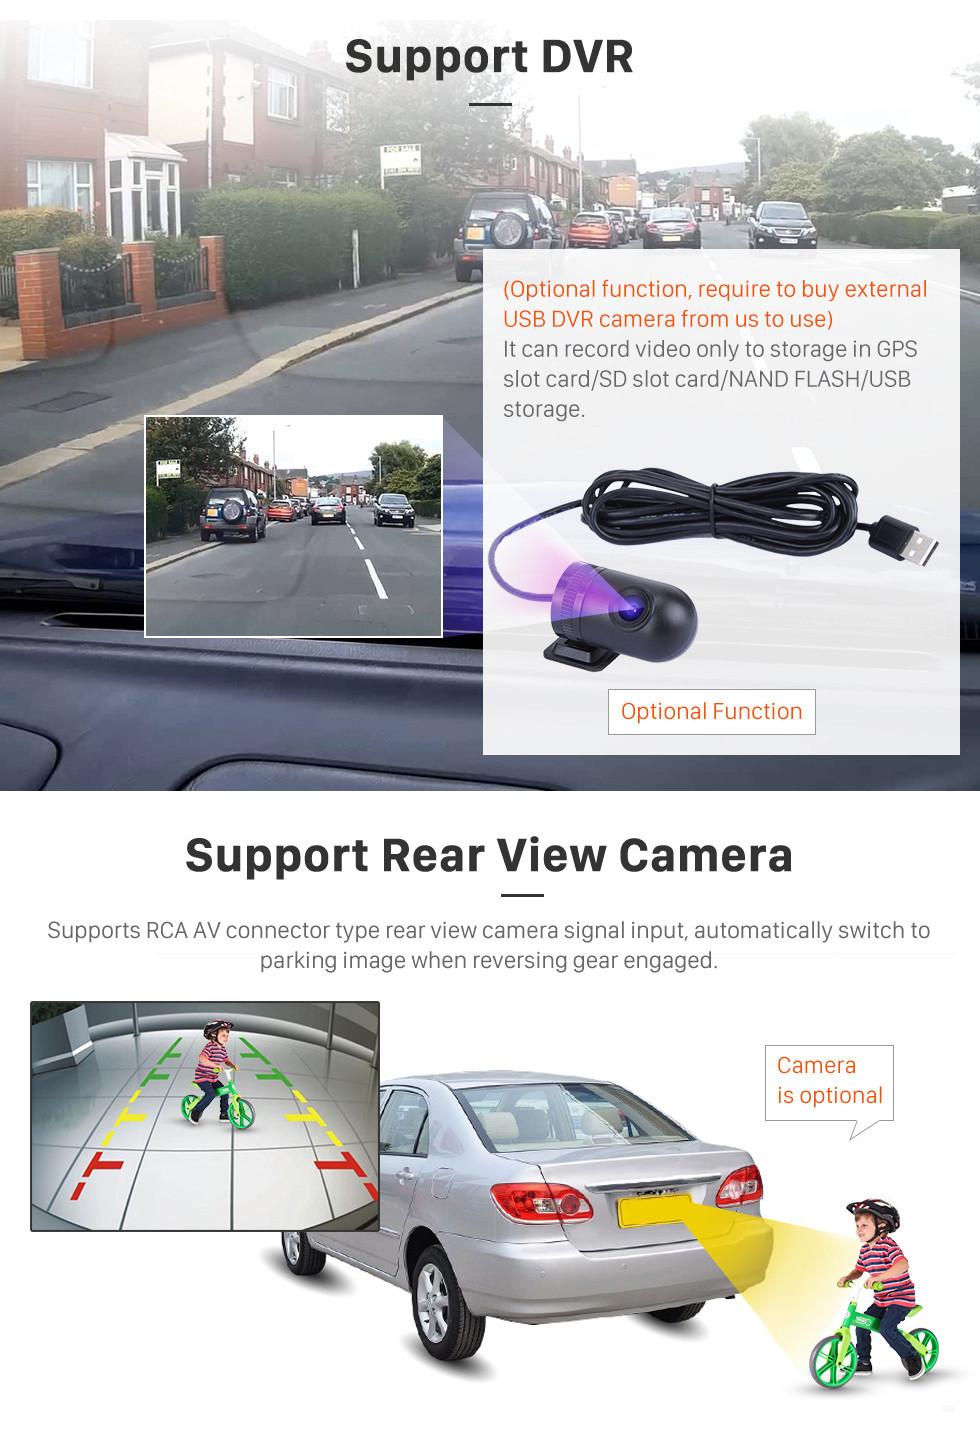 Seicane 2014 2015 2016 2017 HONDA CITY Radio Ersatz mit Android 9.0 HD Touch Screen Blutooth Auto System 3G WiFi Spiegel-Verbindung OBD2 Lenkrad-Steuerung Rückfahrkamera 1080P Video